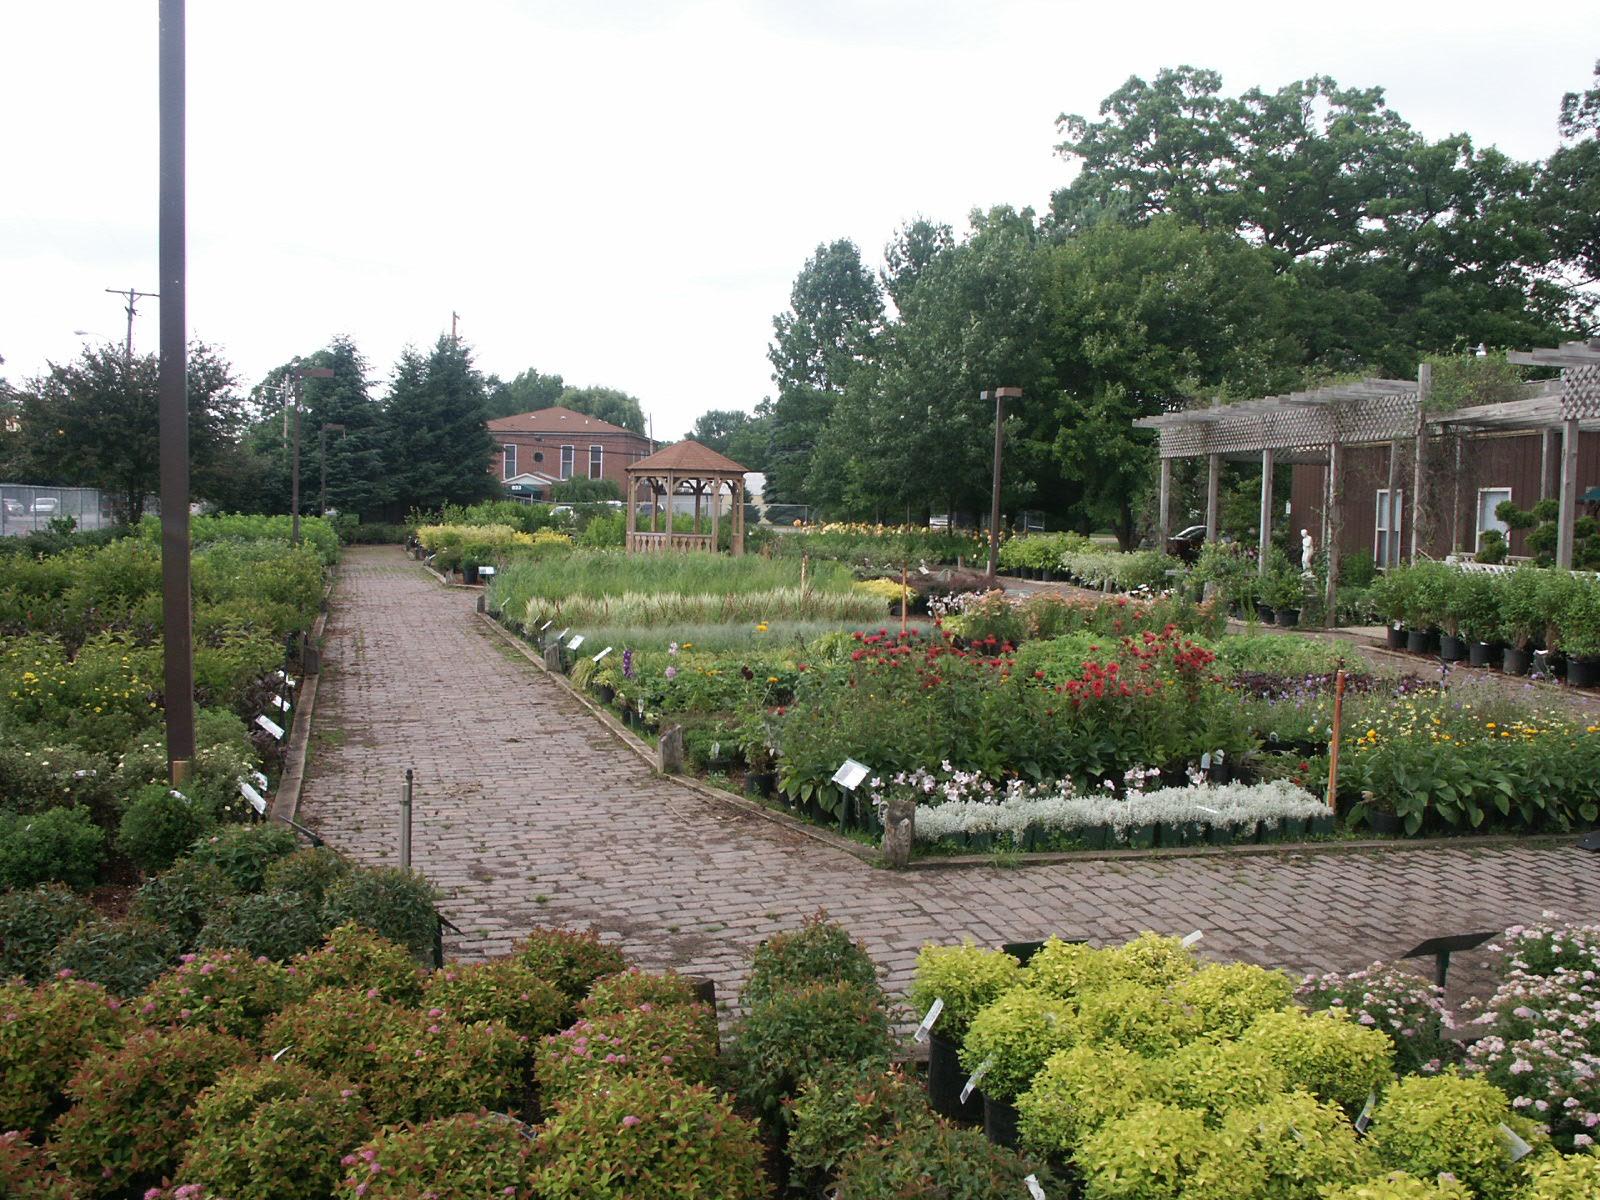 Chapman's Nursery & Garden Center image 0